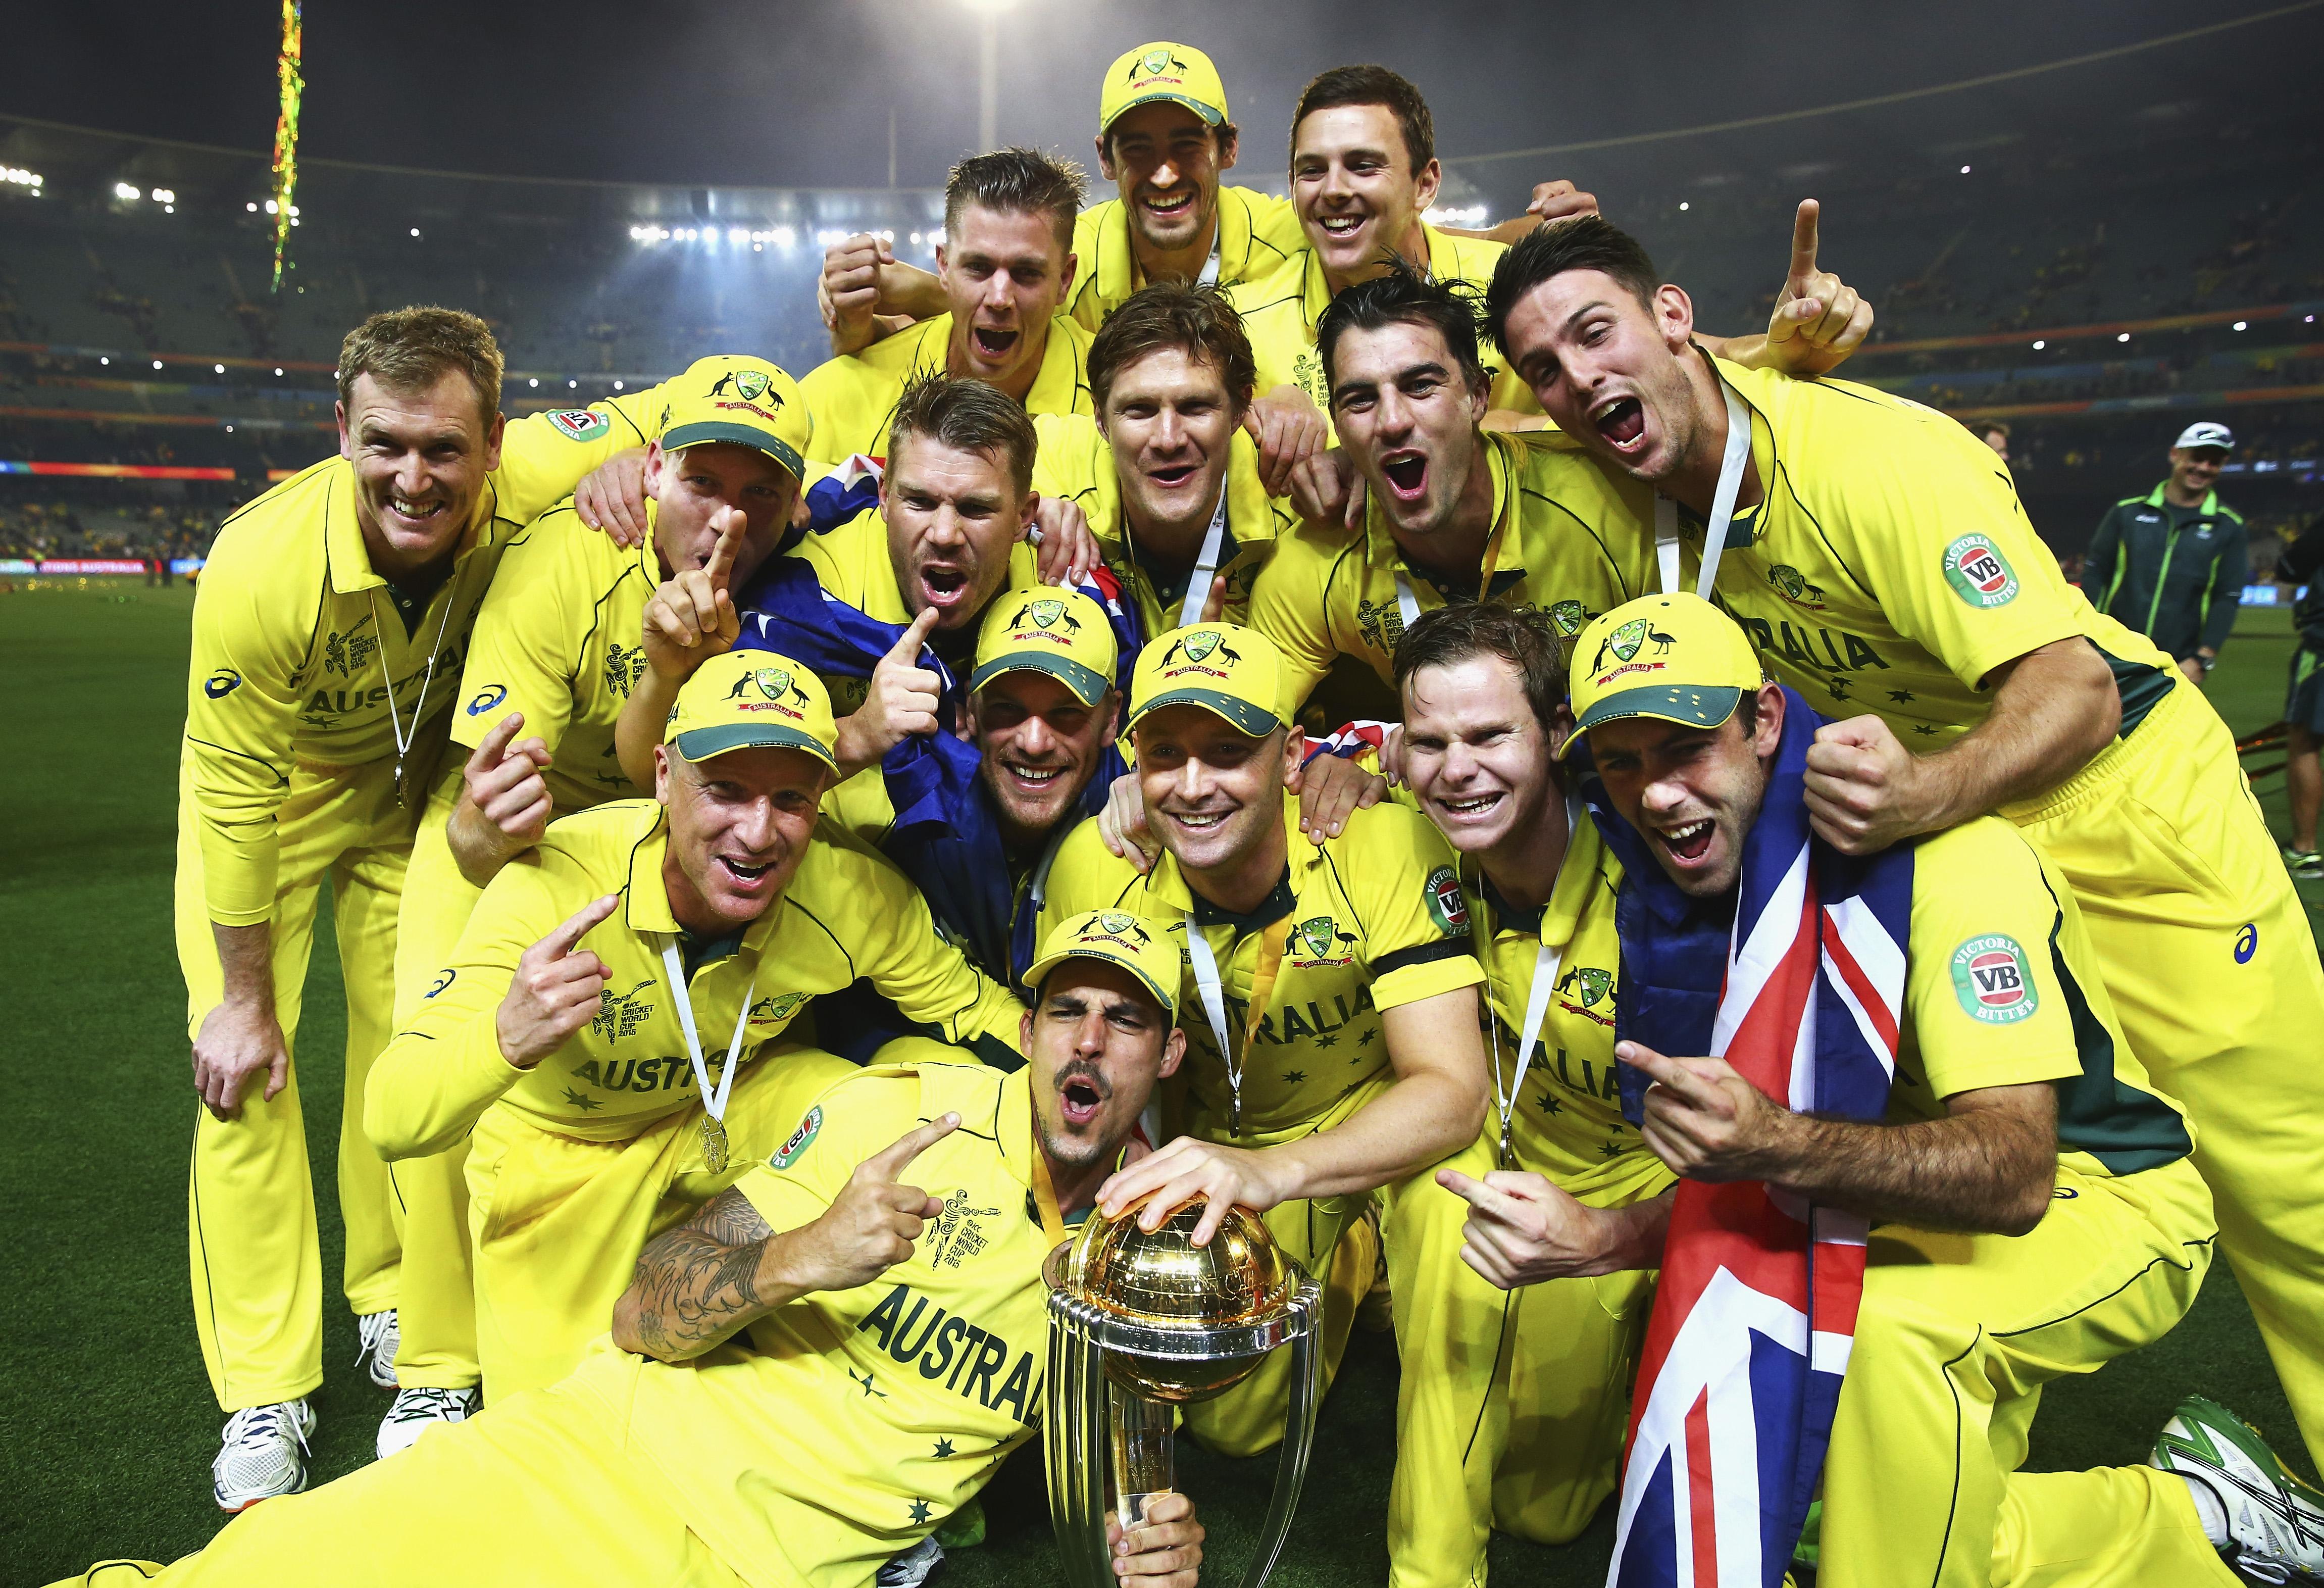 U19 cricket world cup 2021 betting trends texas sport betting